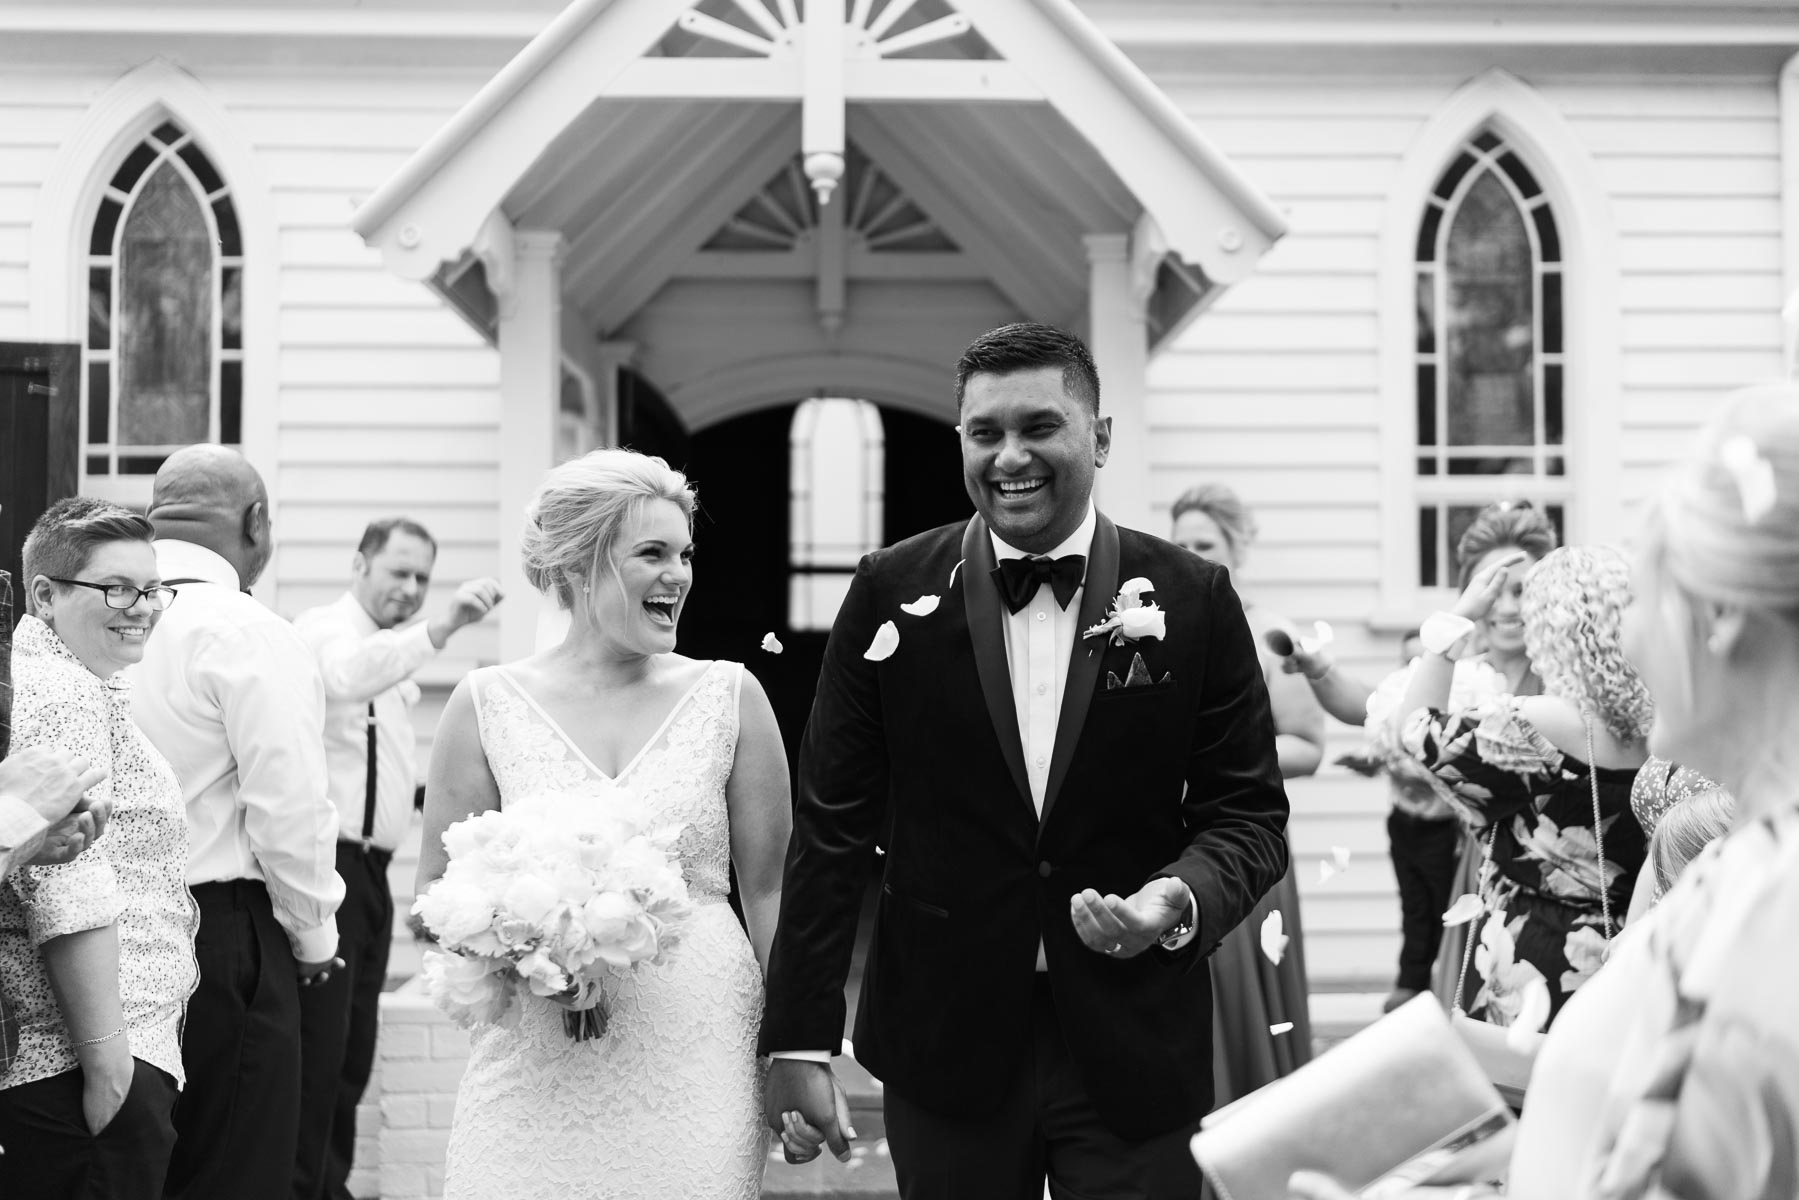 trenavin-chapel-phillip-island-wedding-heart+soul-weddings-sally-sean-00380.jpg